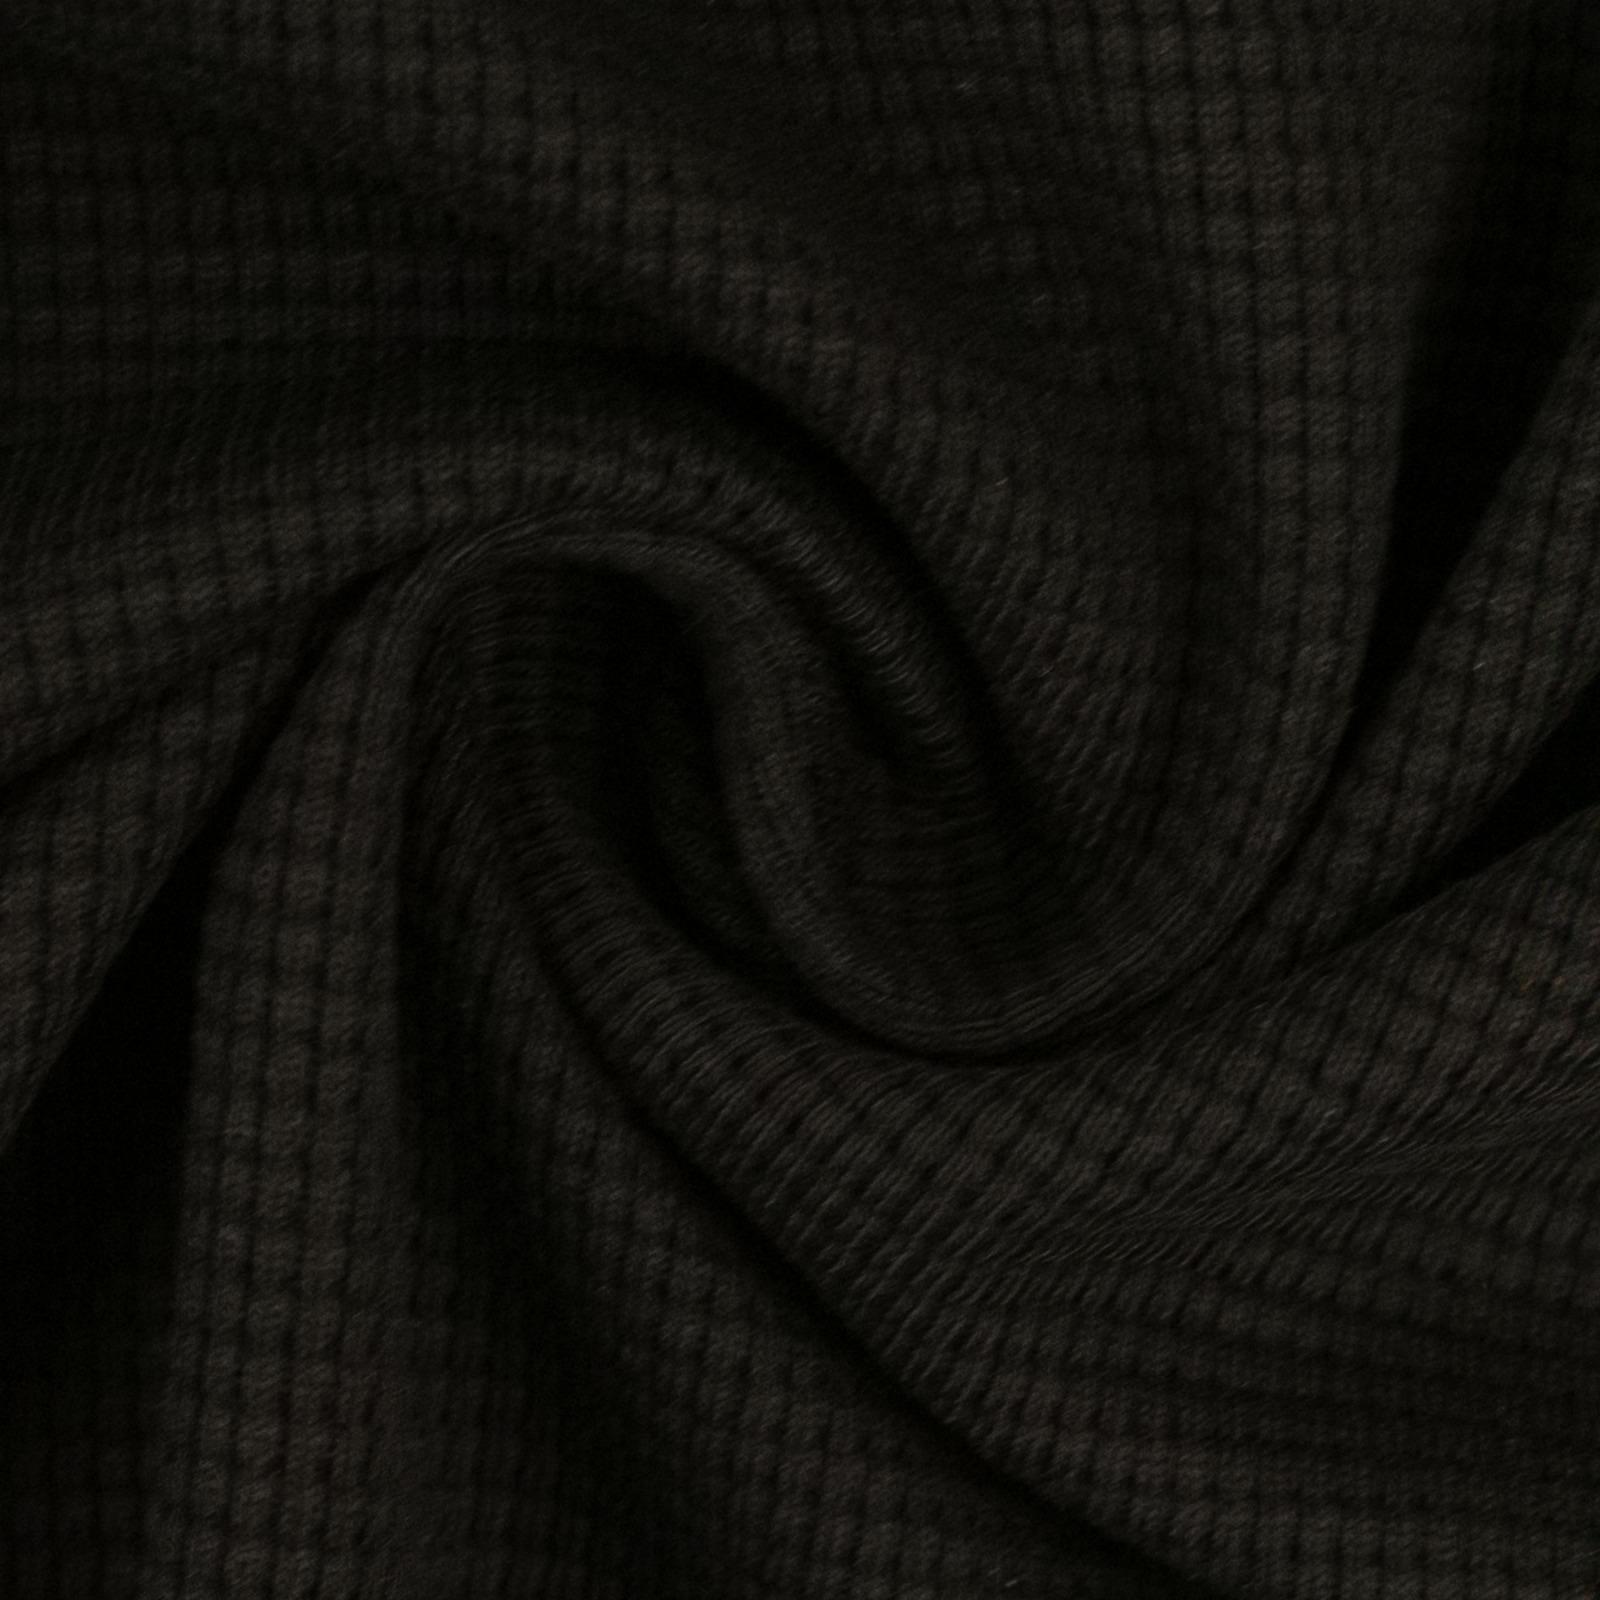 Waffeljersey 100 Baumwolle schwarz 1450 EUR/m